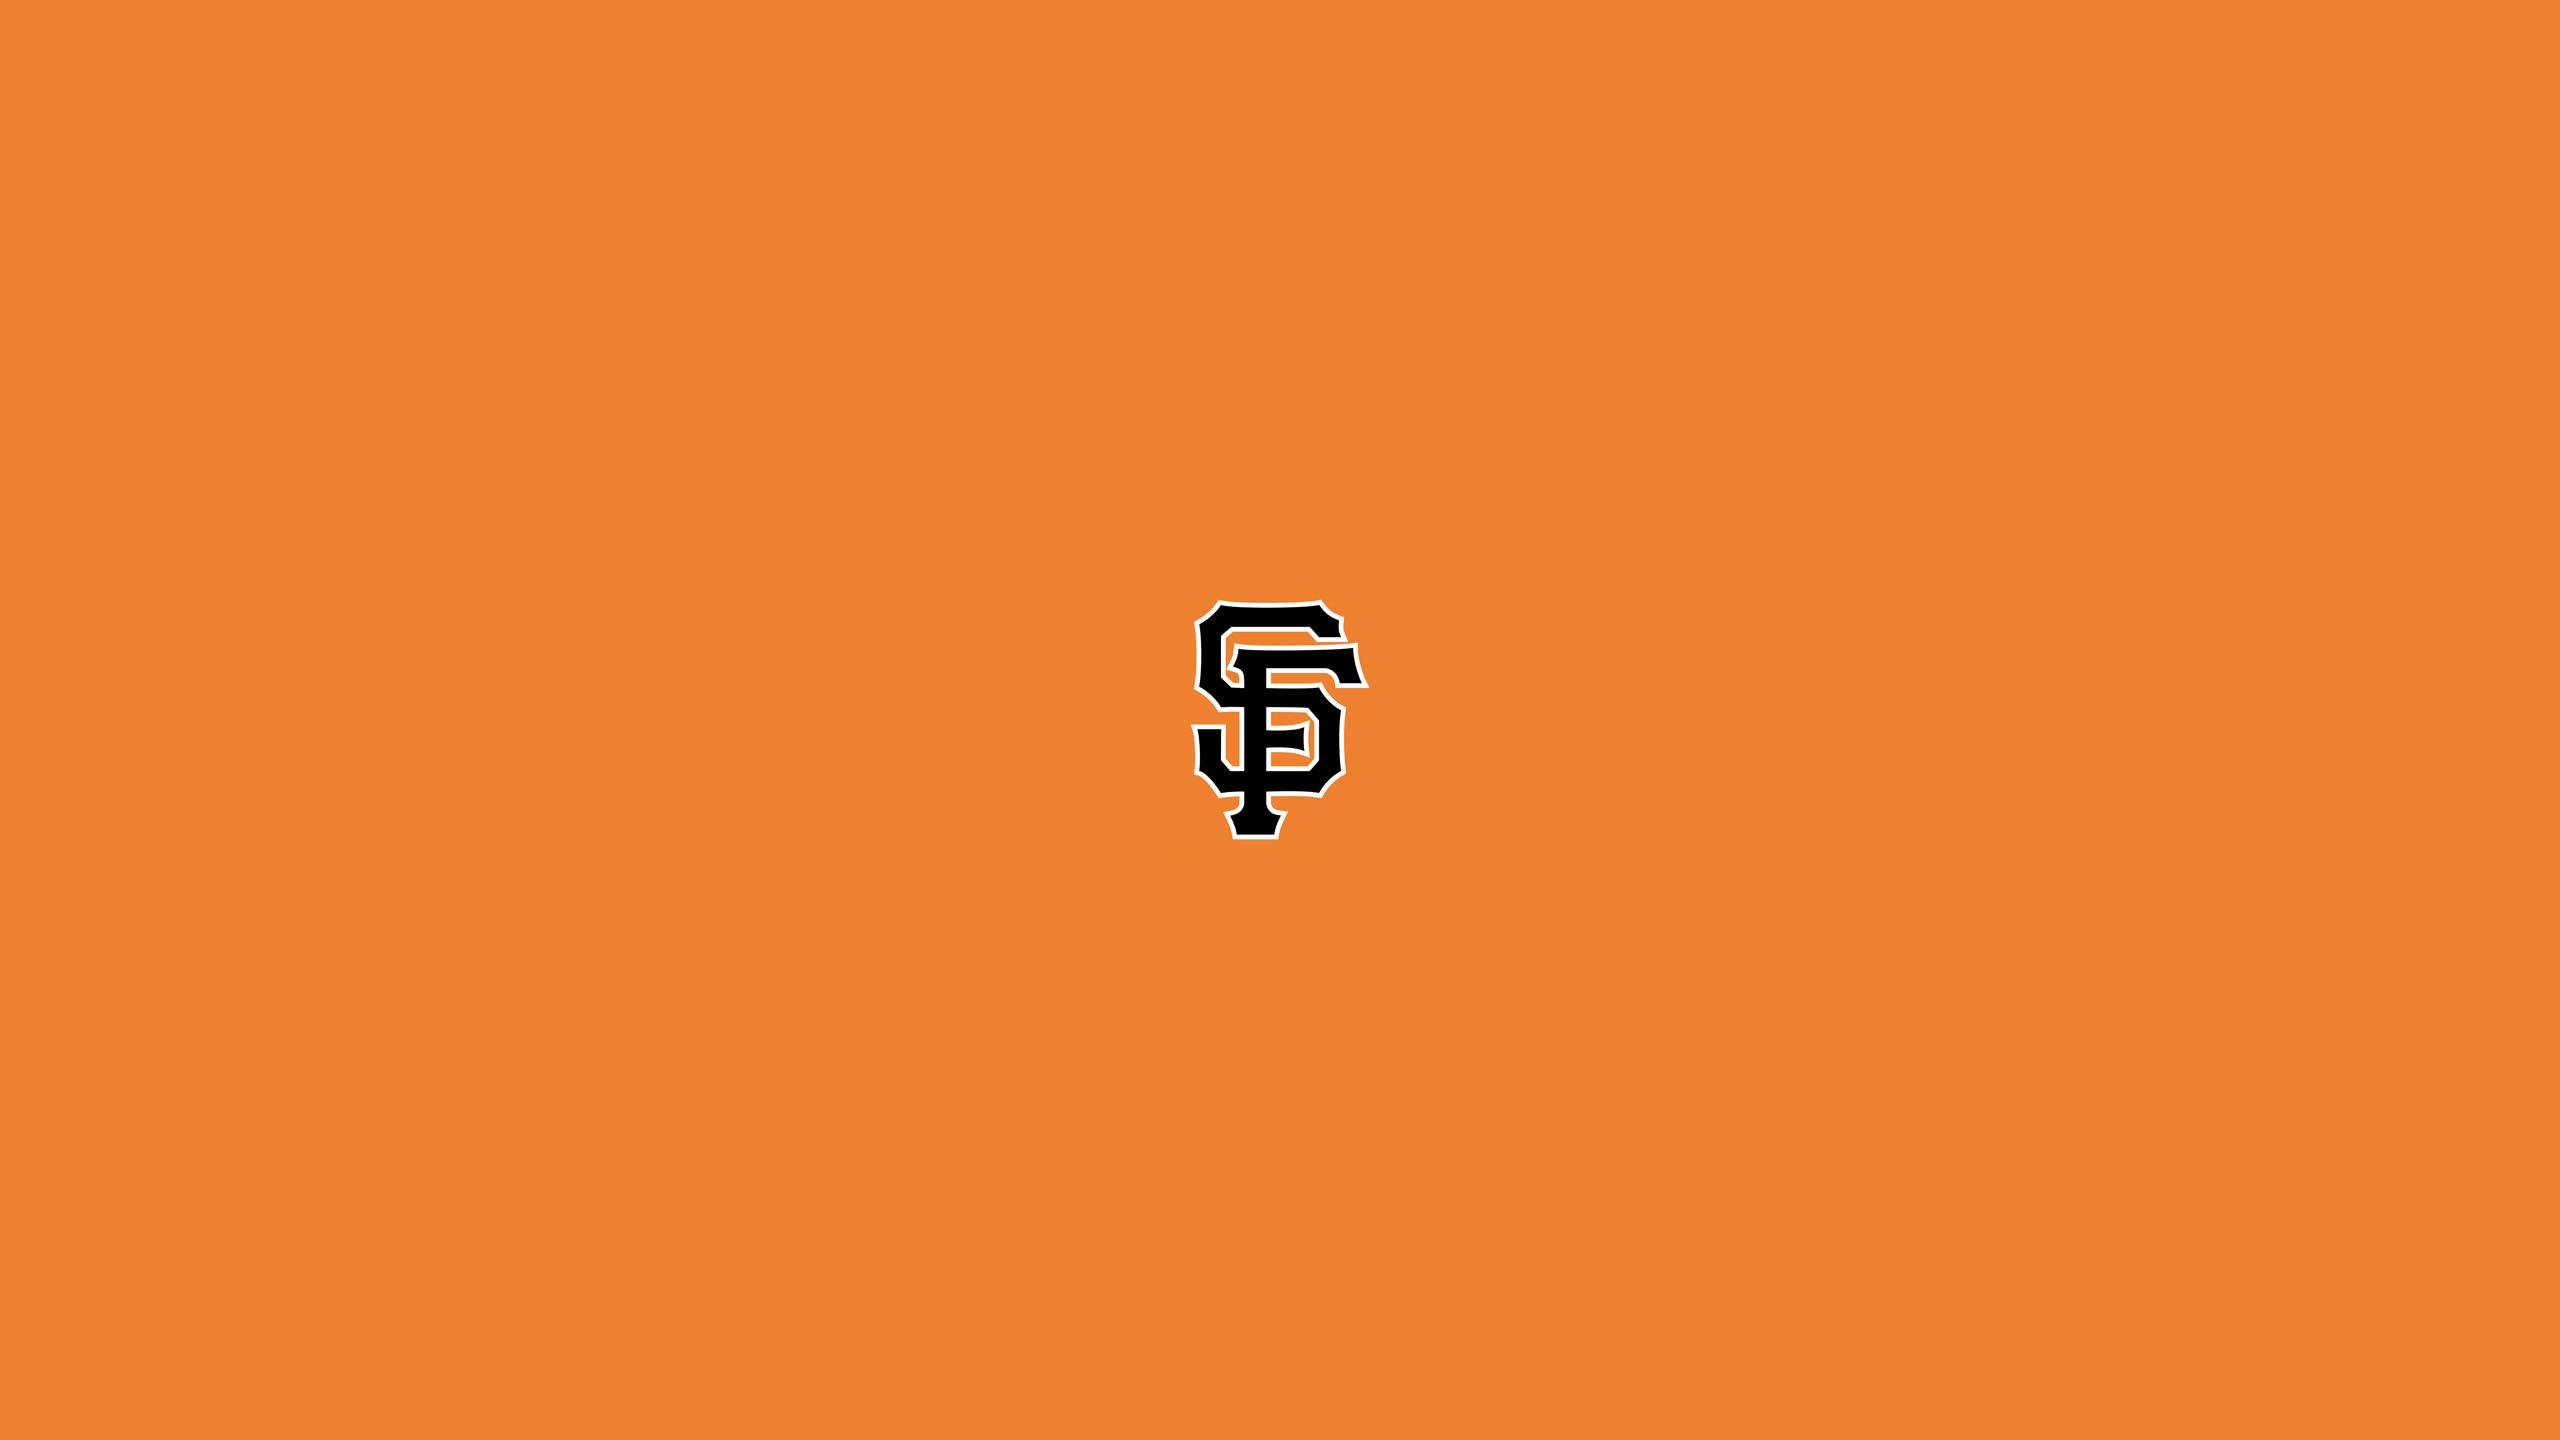 64 San Francisco Giants